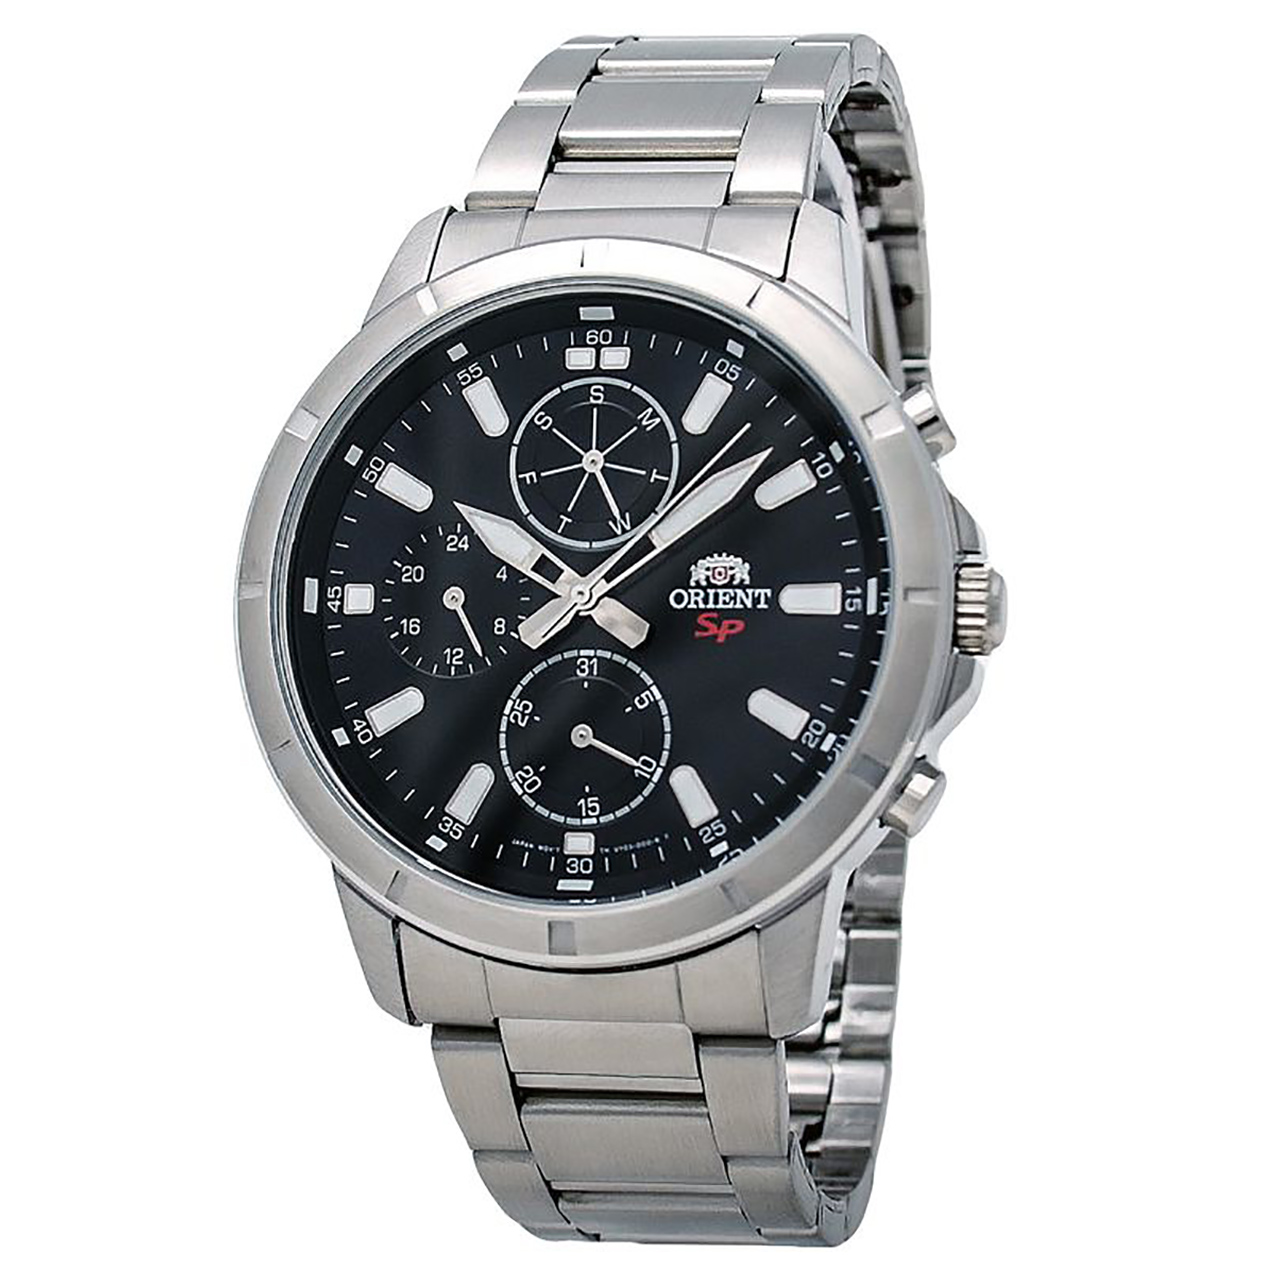 ساعت   اورینت مدل SUY03001B0